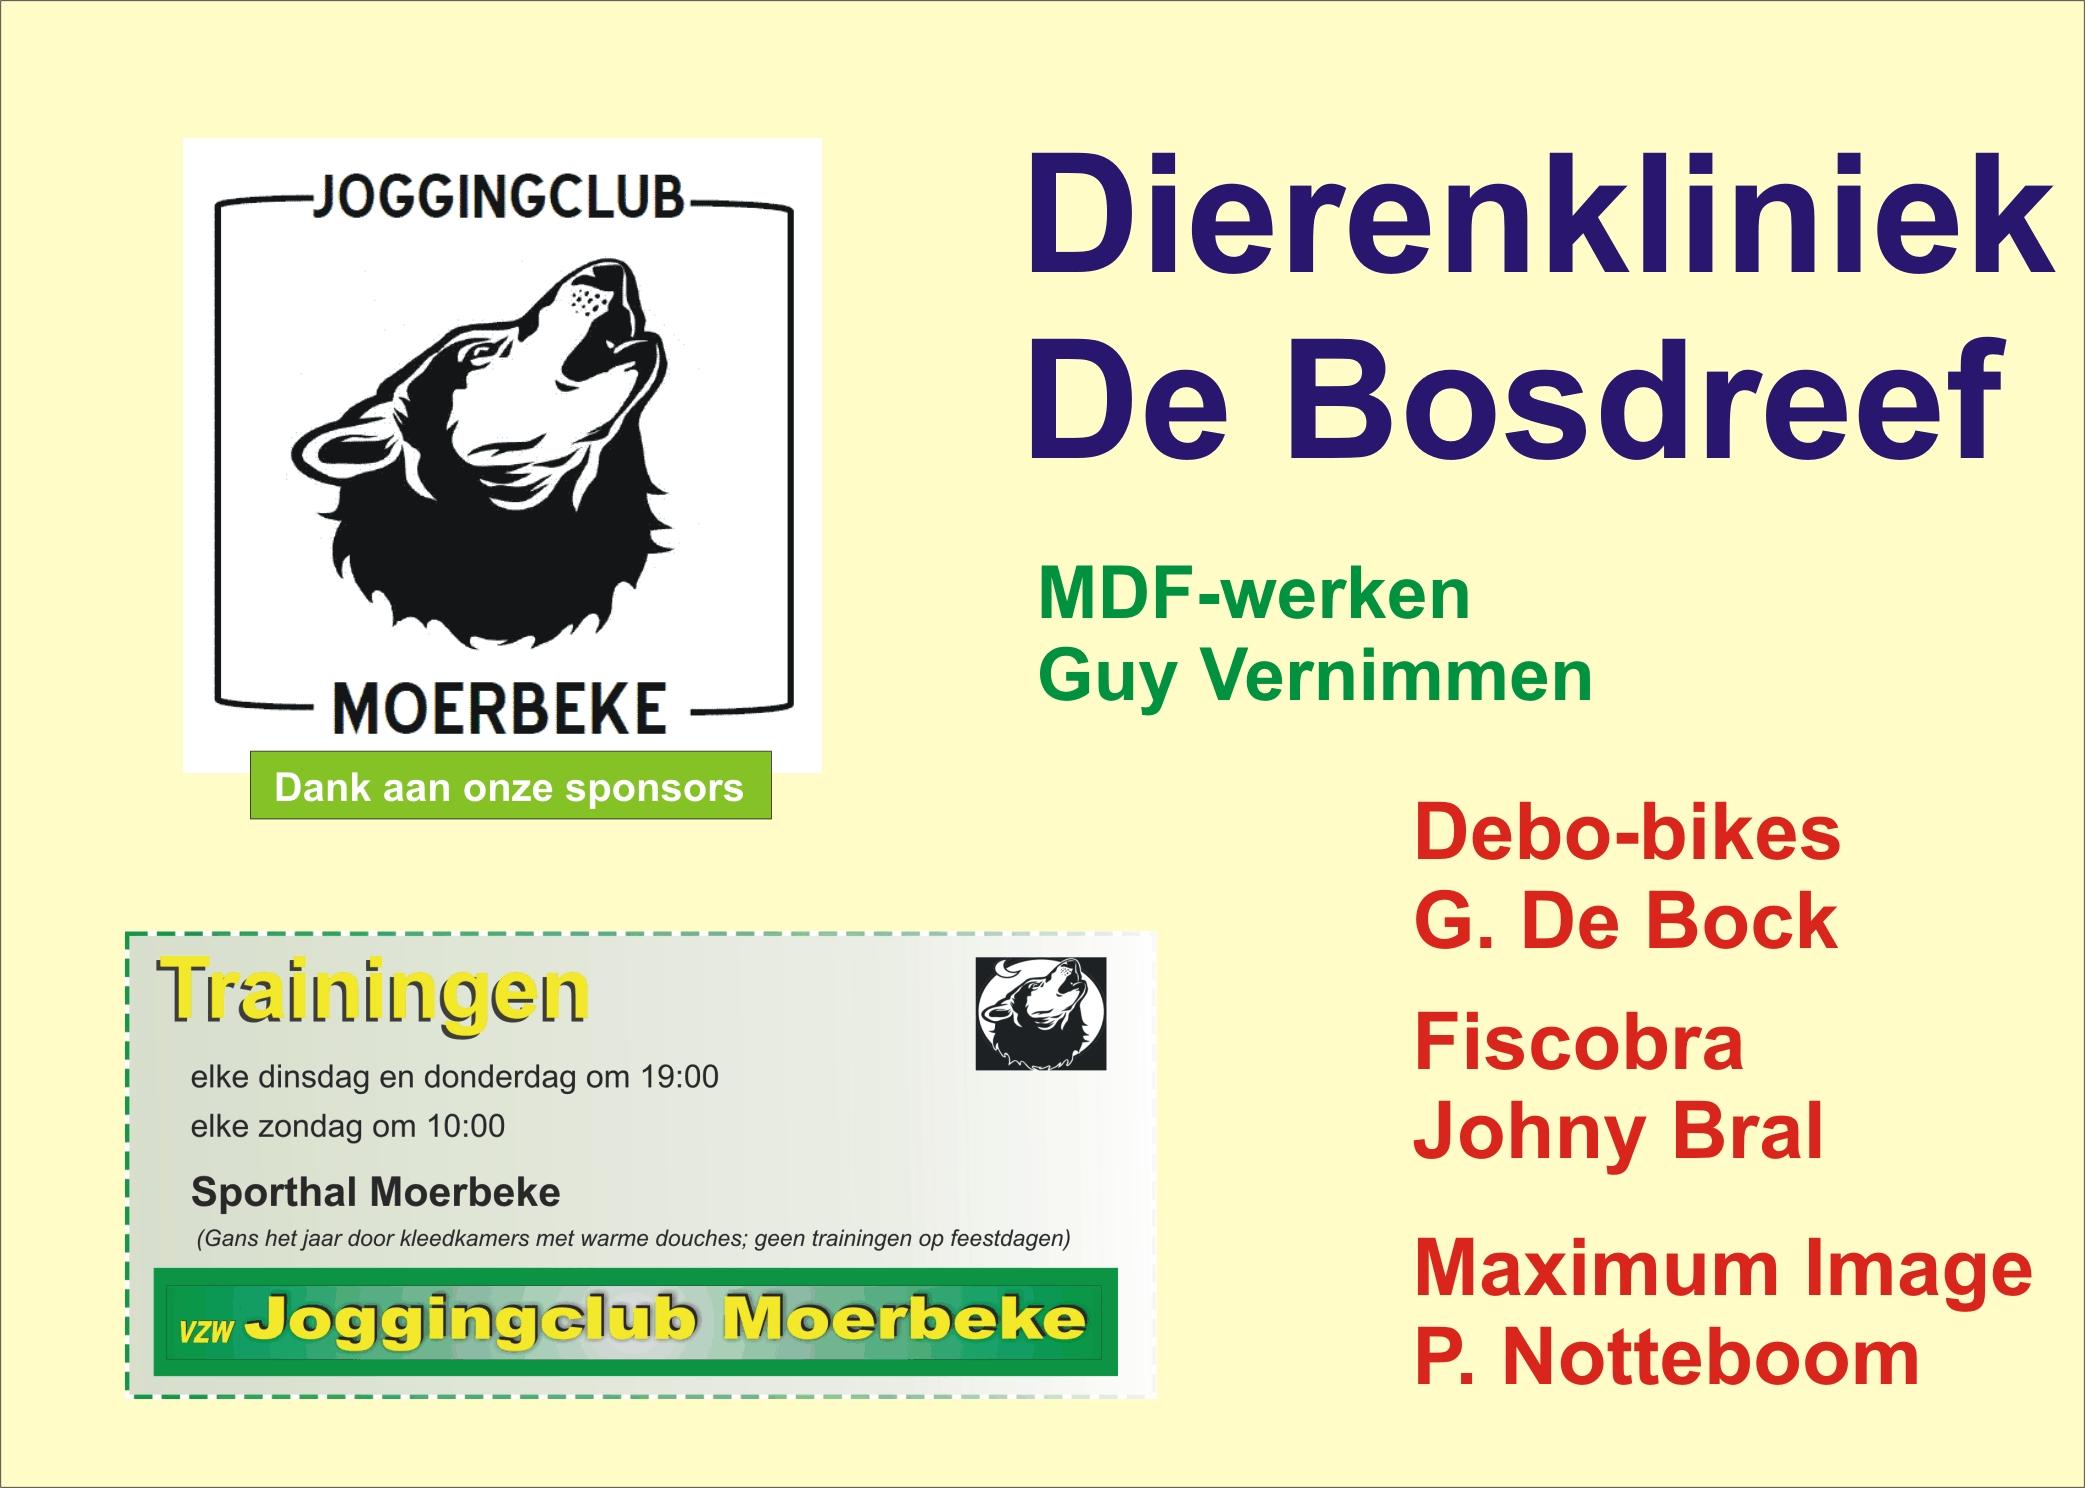 http://www.joggingclubmoerbeke.be/2014/mhl/mhlspons09.jpg